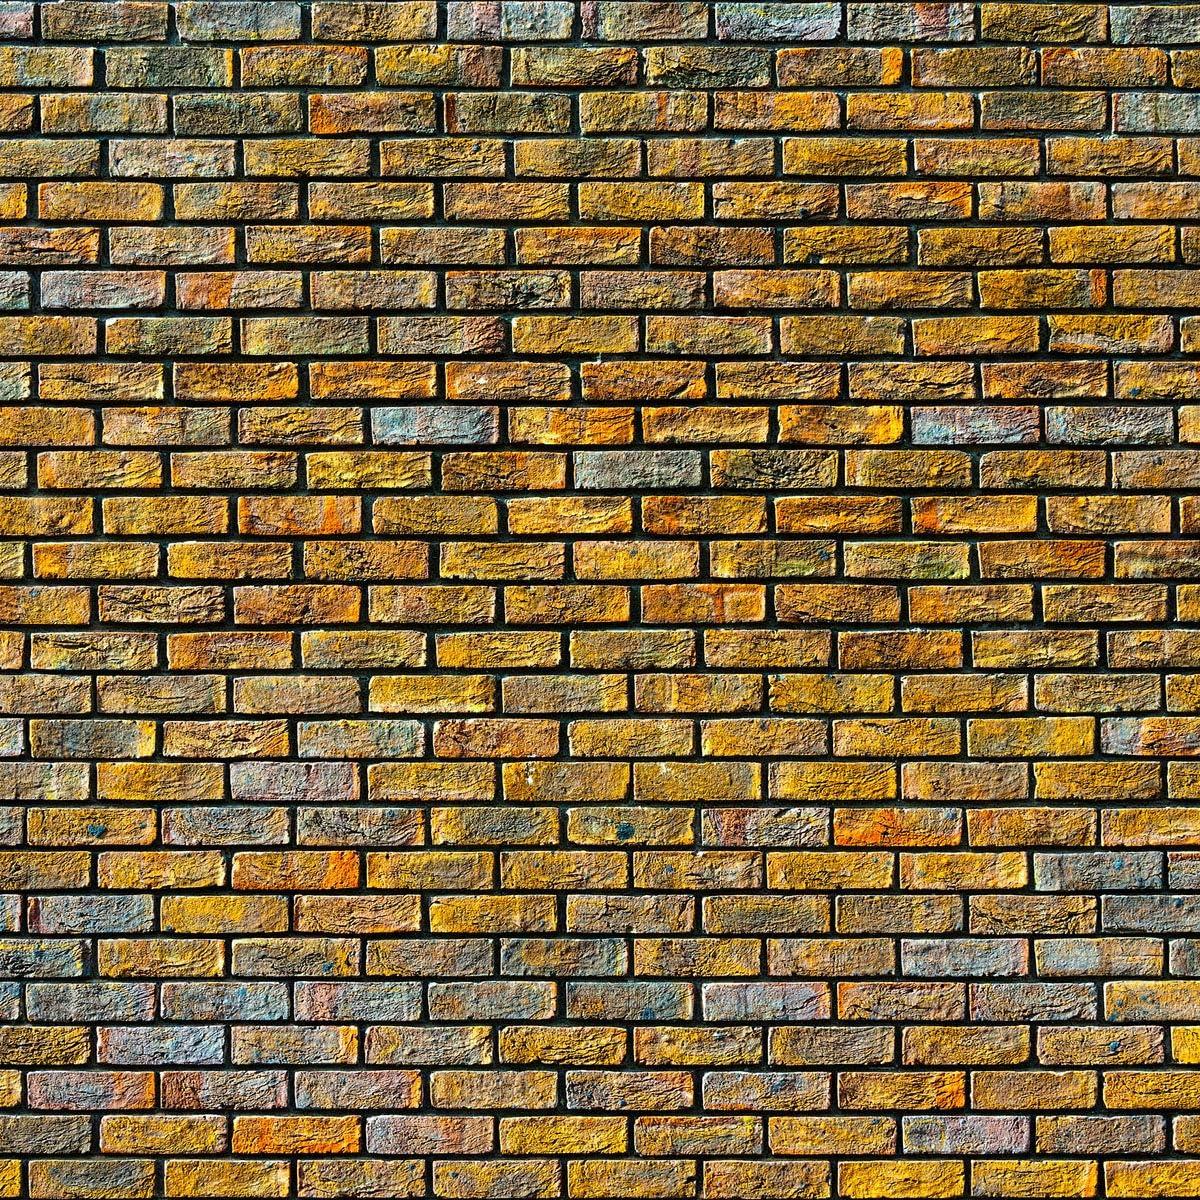 10x6.5ft Old Brick Decoration Backdrops Child Photo Background for Studio Photography Backdrop